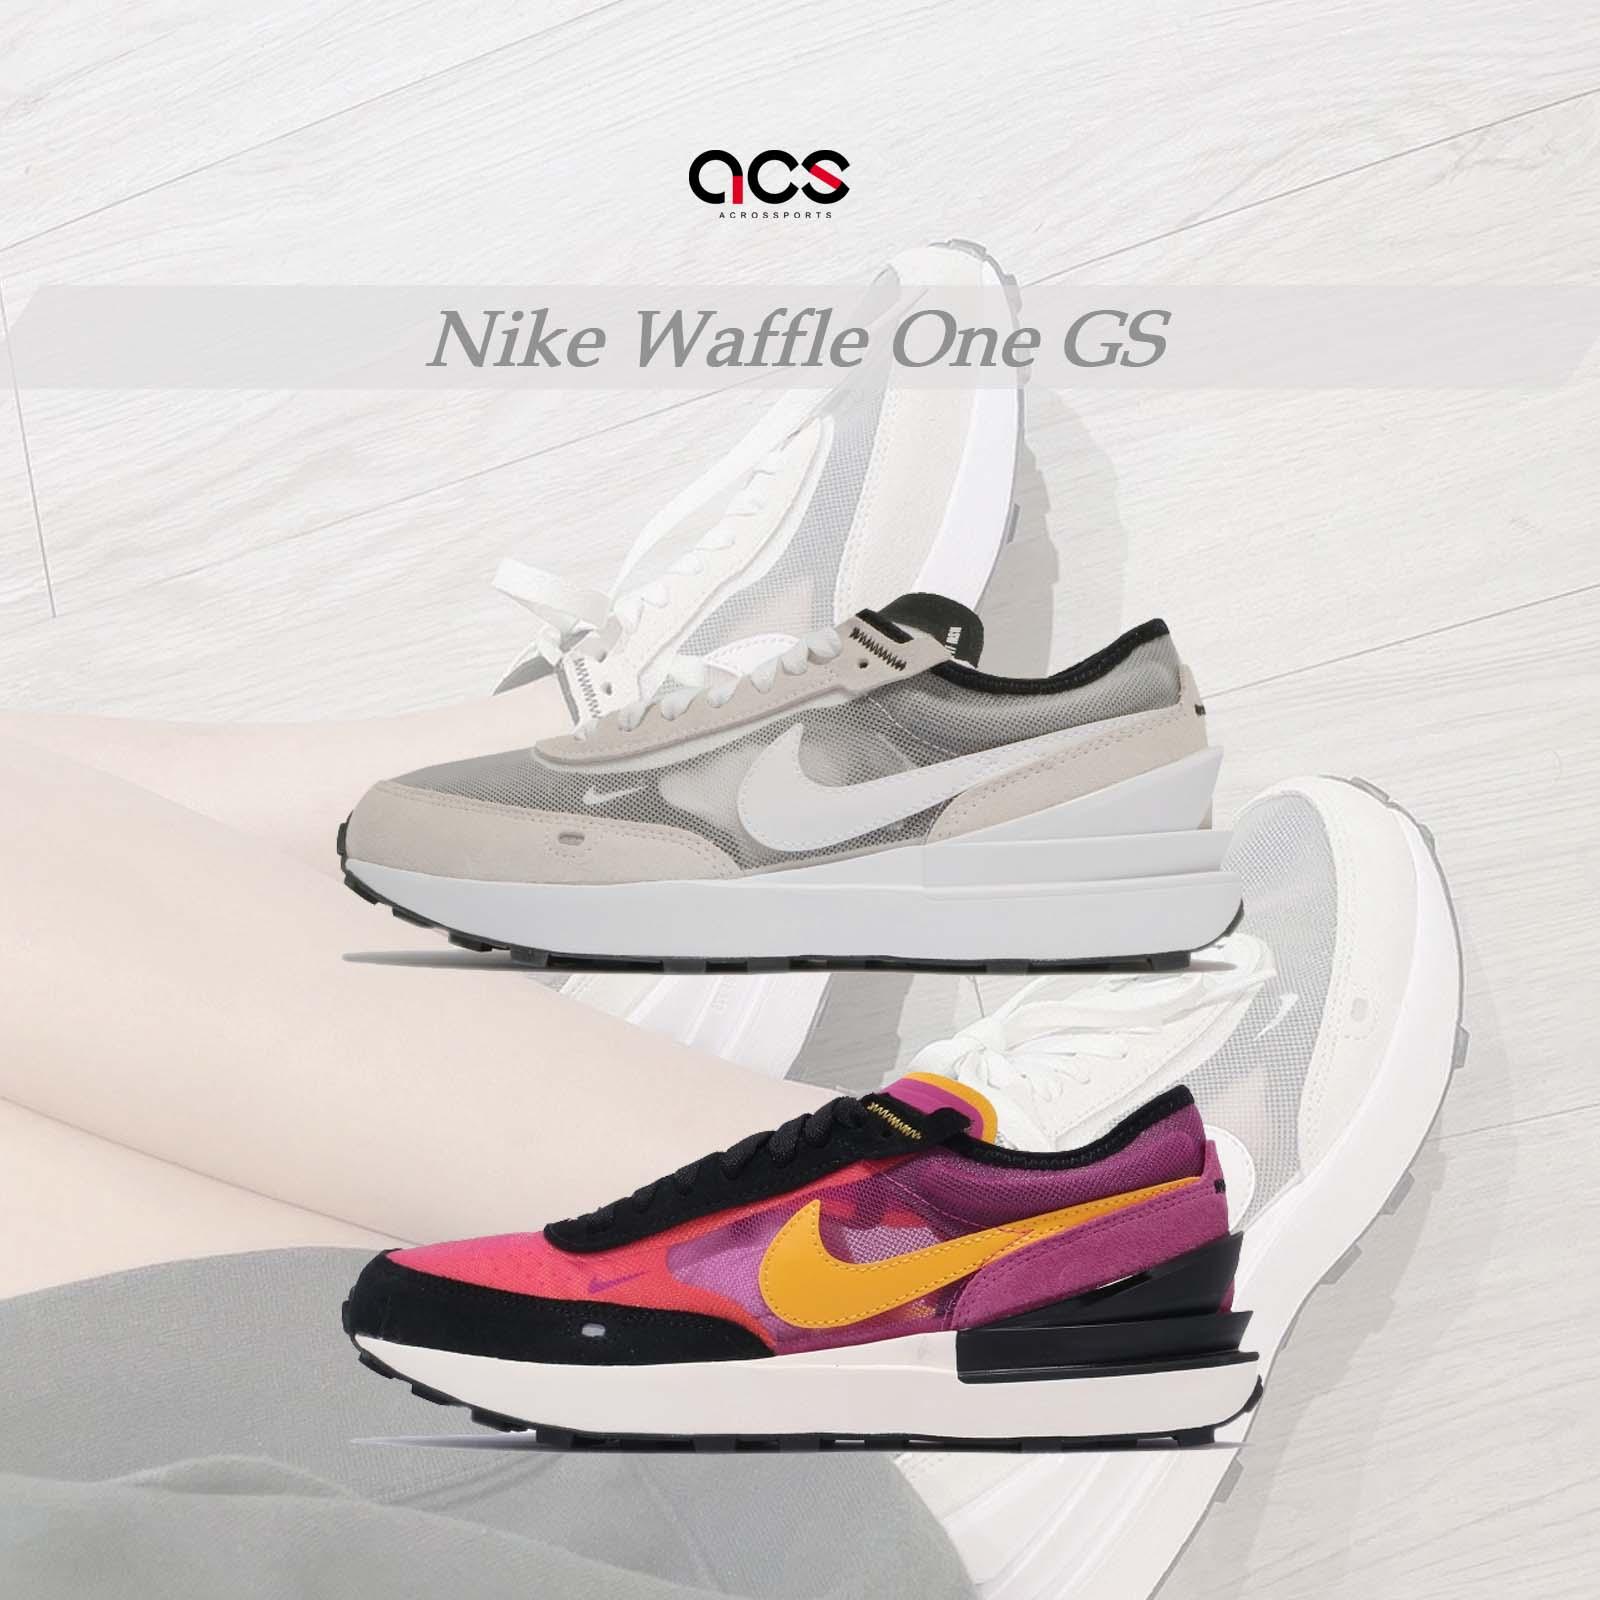 Nike 休閒鞋 Waffle One GS 小Sacai 平民版 女鞋 大童鞋 灰白 紫黃 任選【ACS】